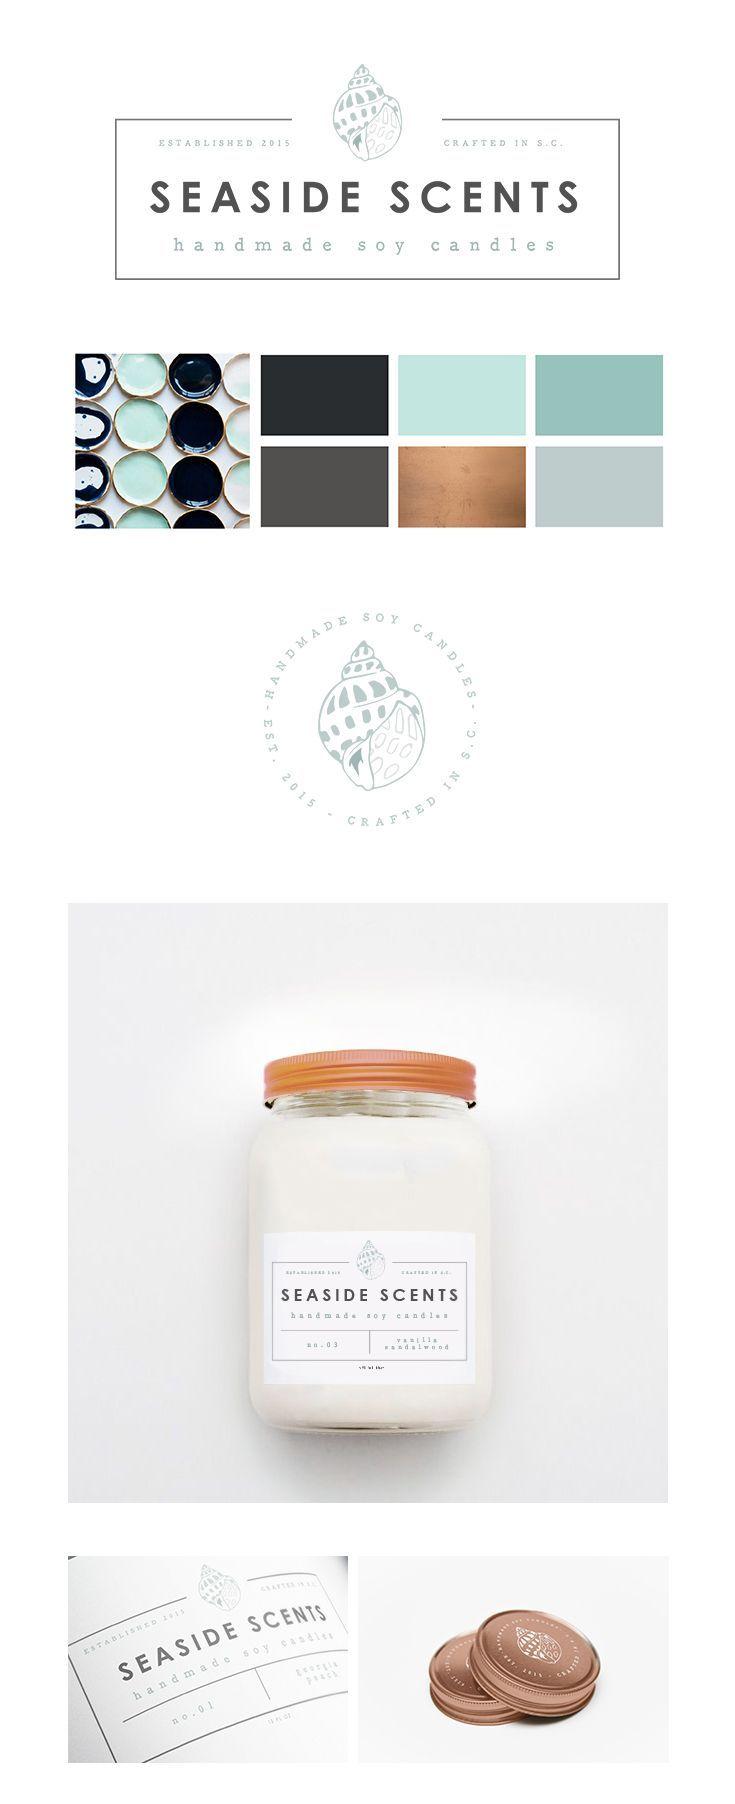 Seaside Scents | Modern Candle Label Design | Brand Identity Pack | MVAZ Design | http://www.mvazdesign.com